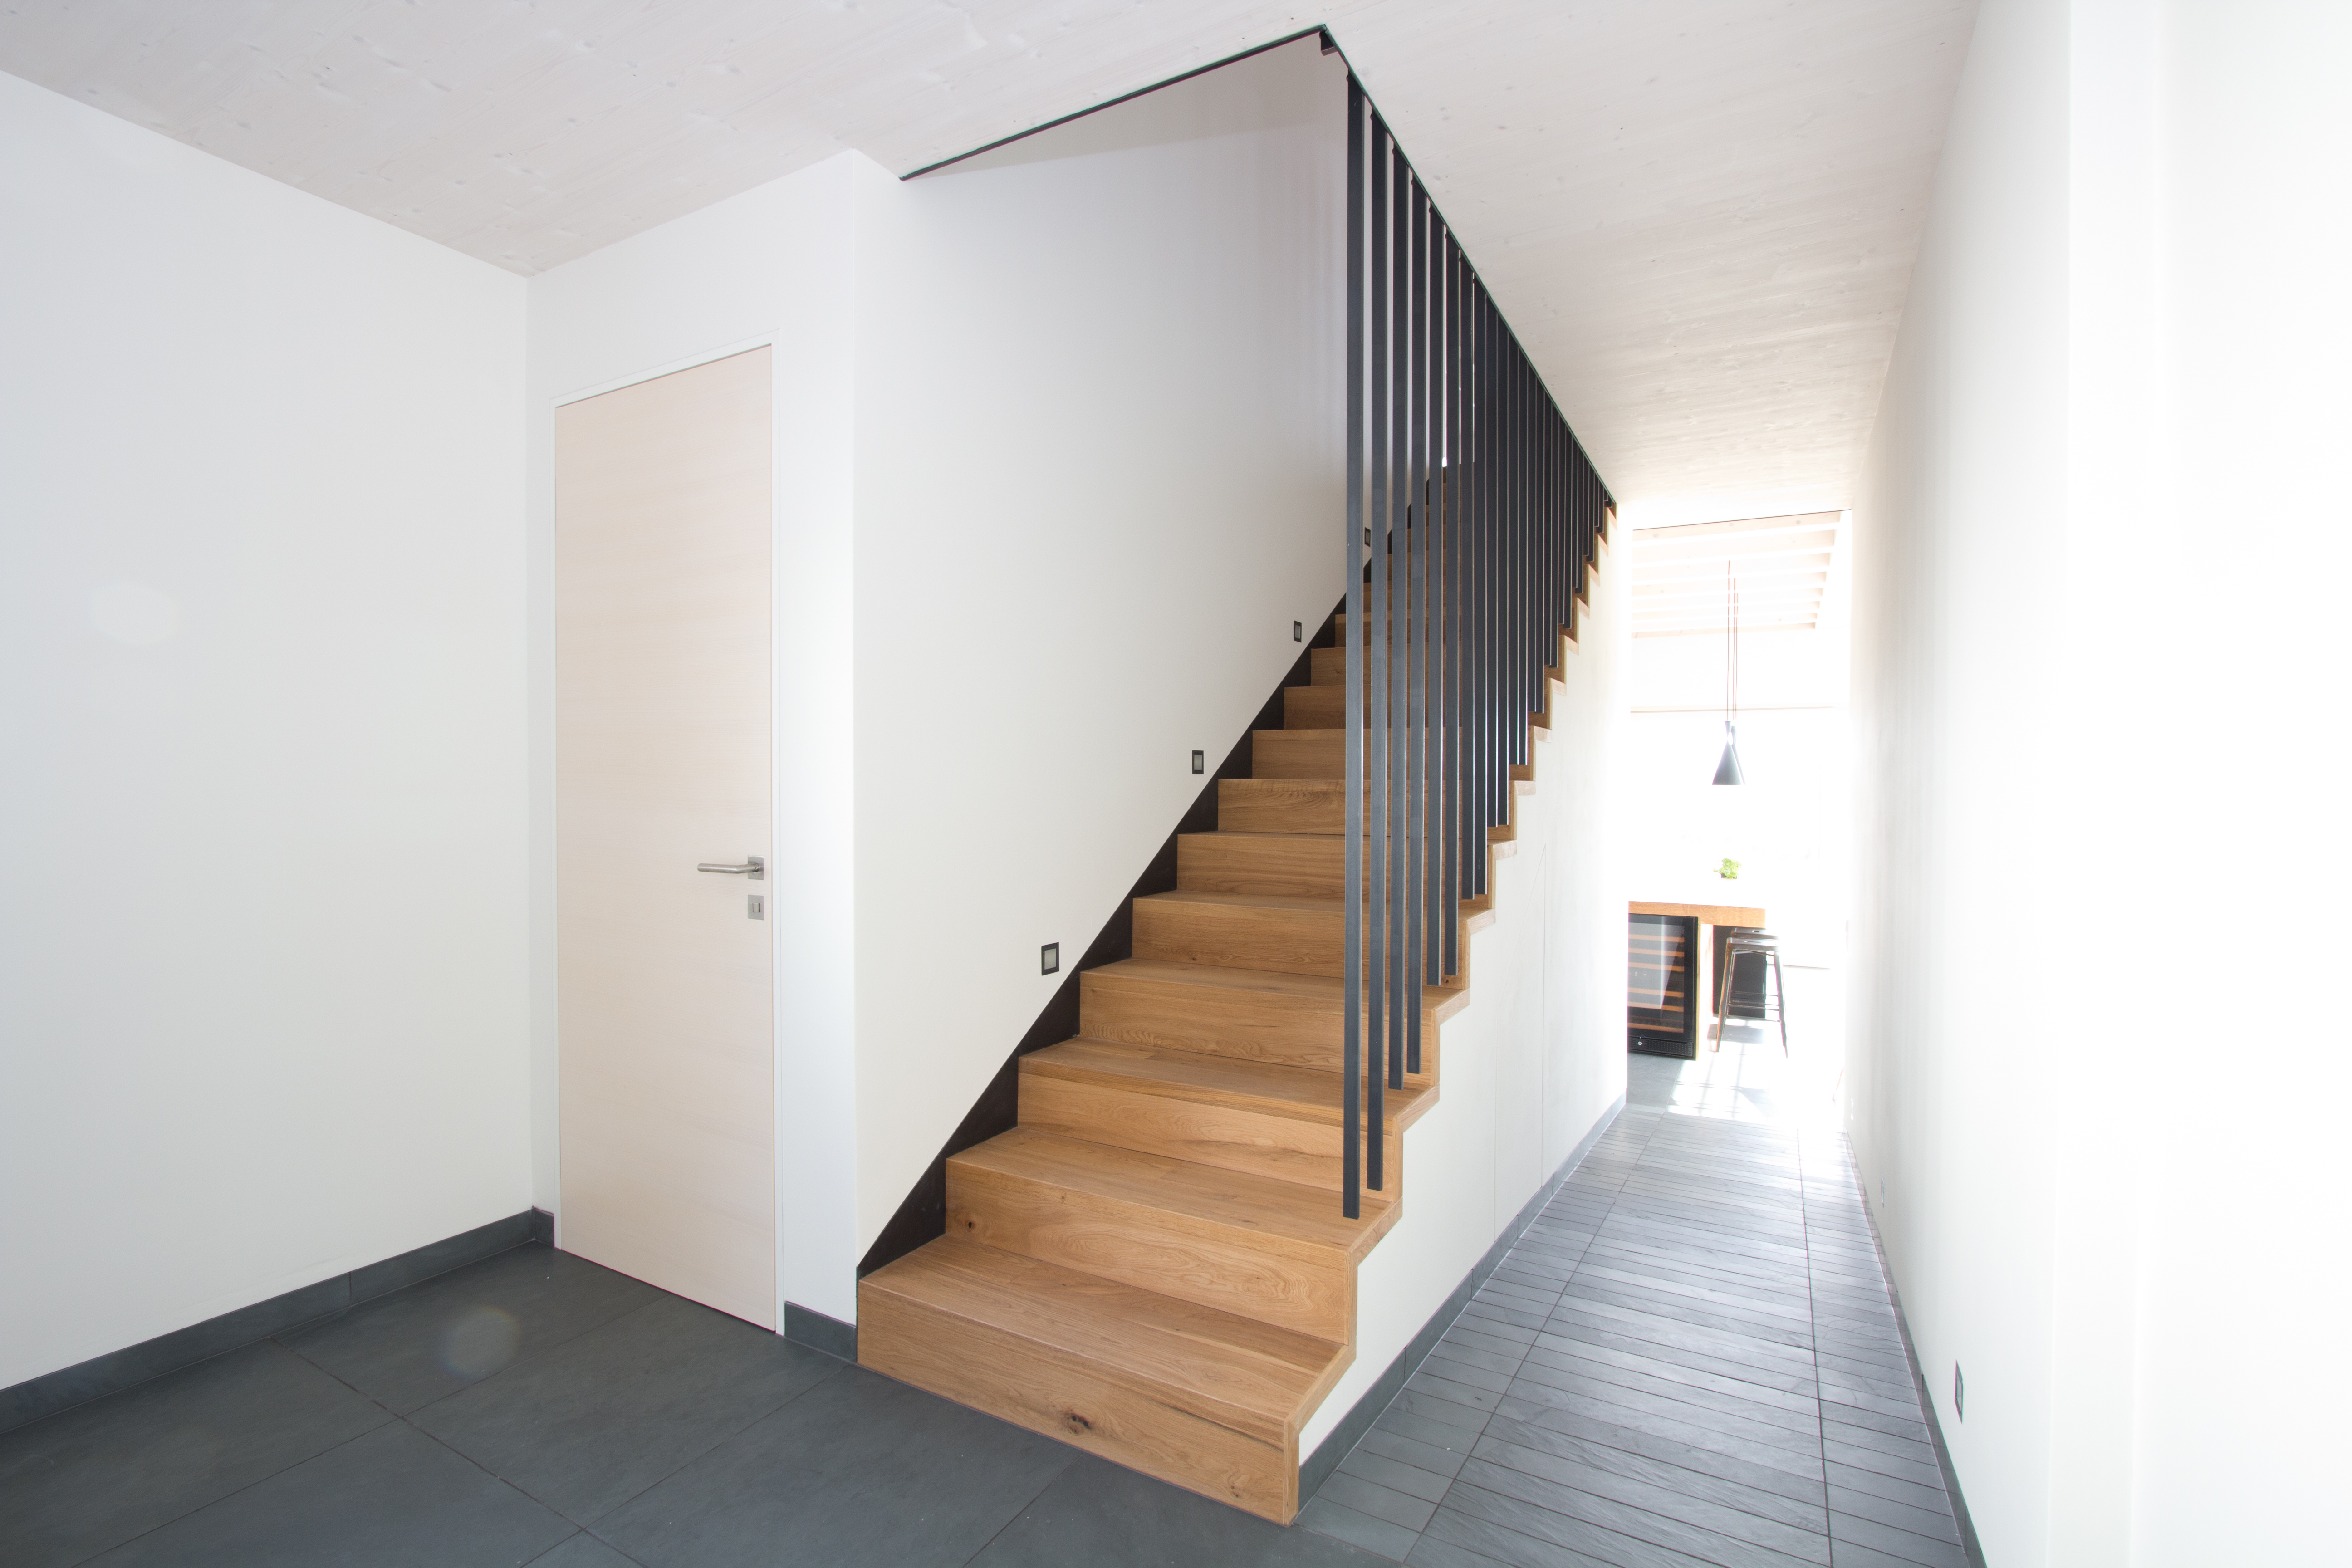 eichentreppe mit blank stahl gel nder. Black Bedroom Furniture Sets. Home Design Ideas